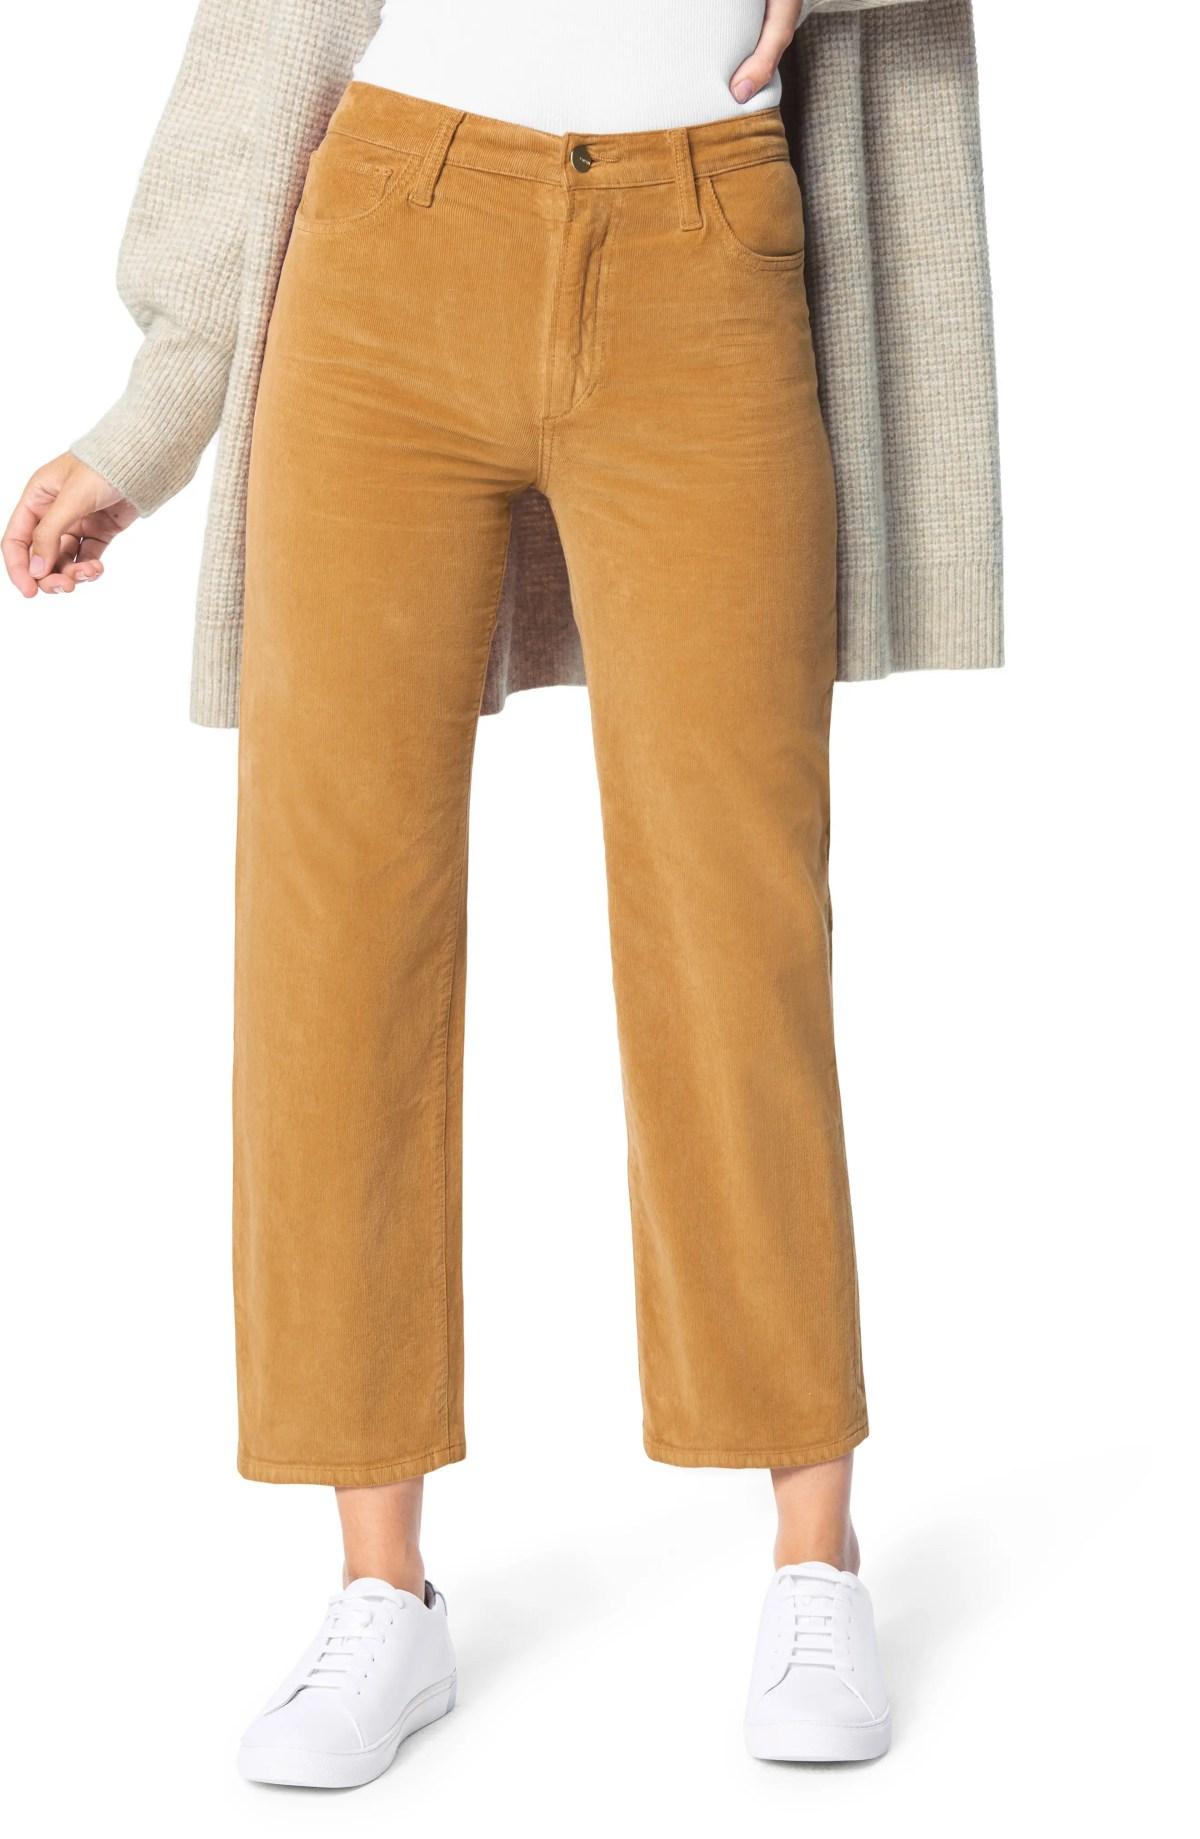 JOE'S The Blake High Waist Crop Wide Leg Corduroy Jeans, Main, color, BUTTERSCOTCH